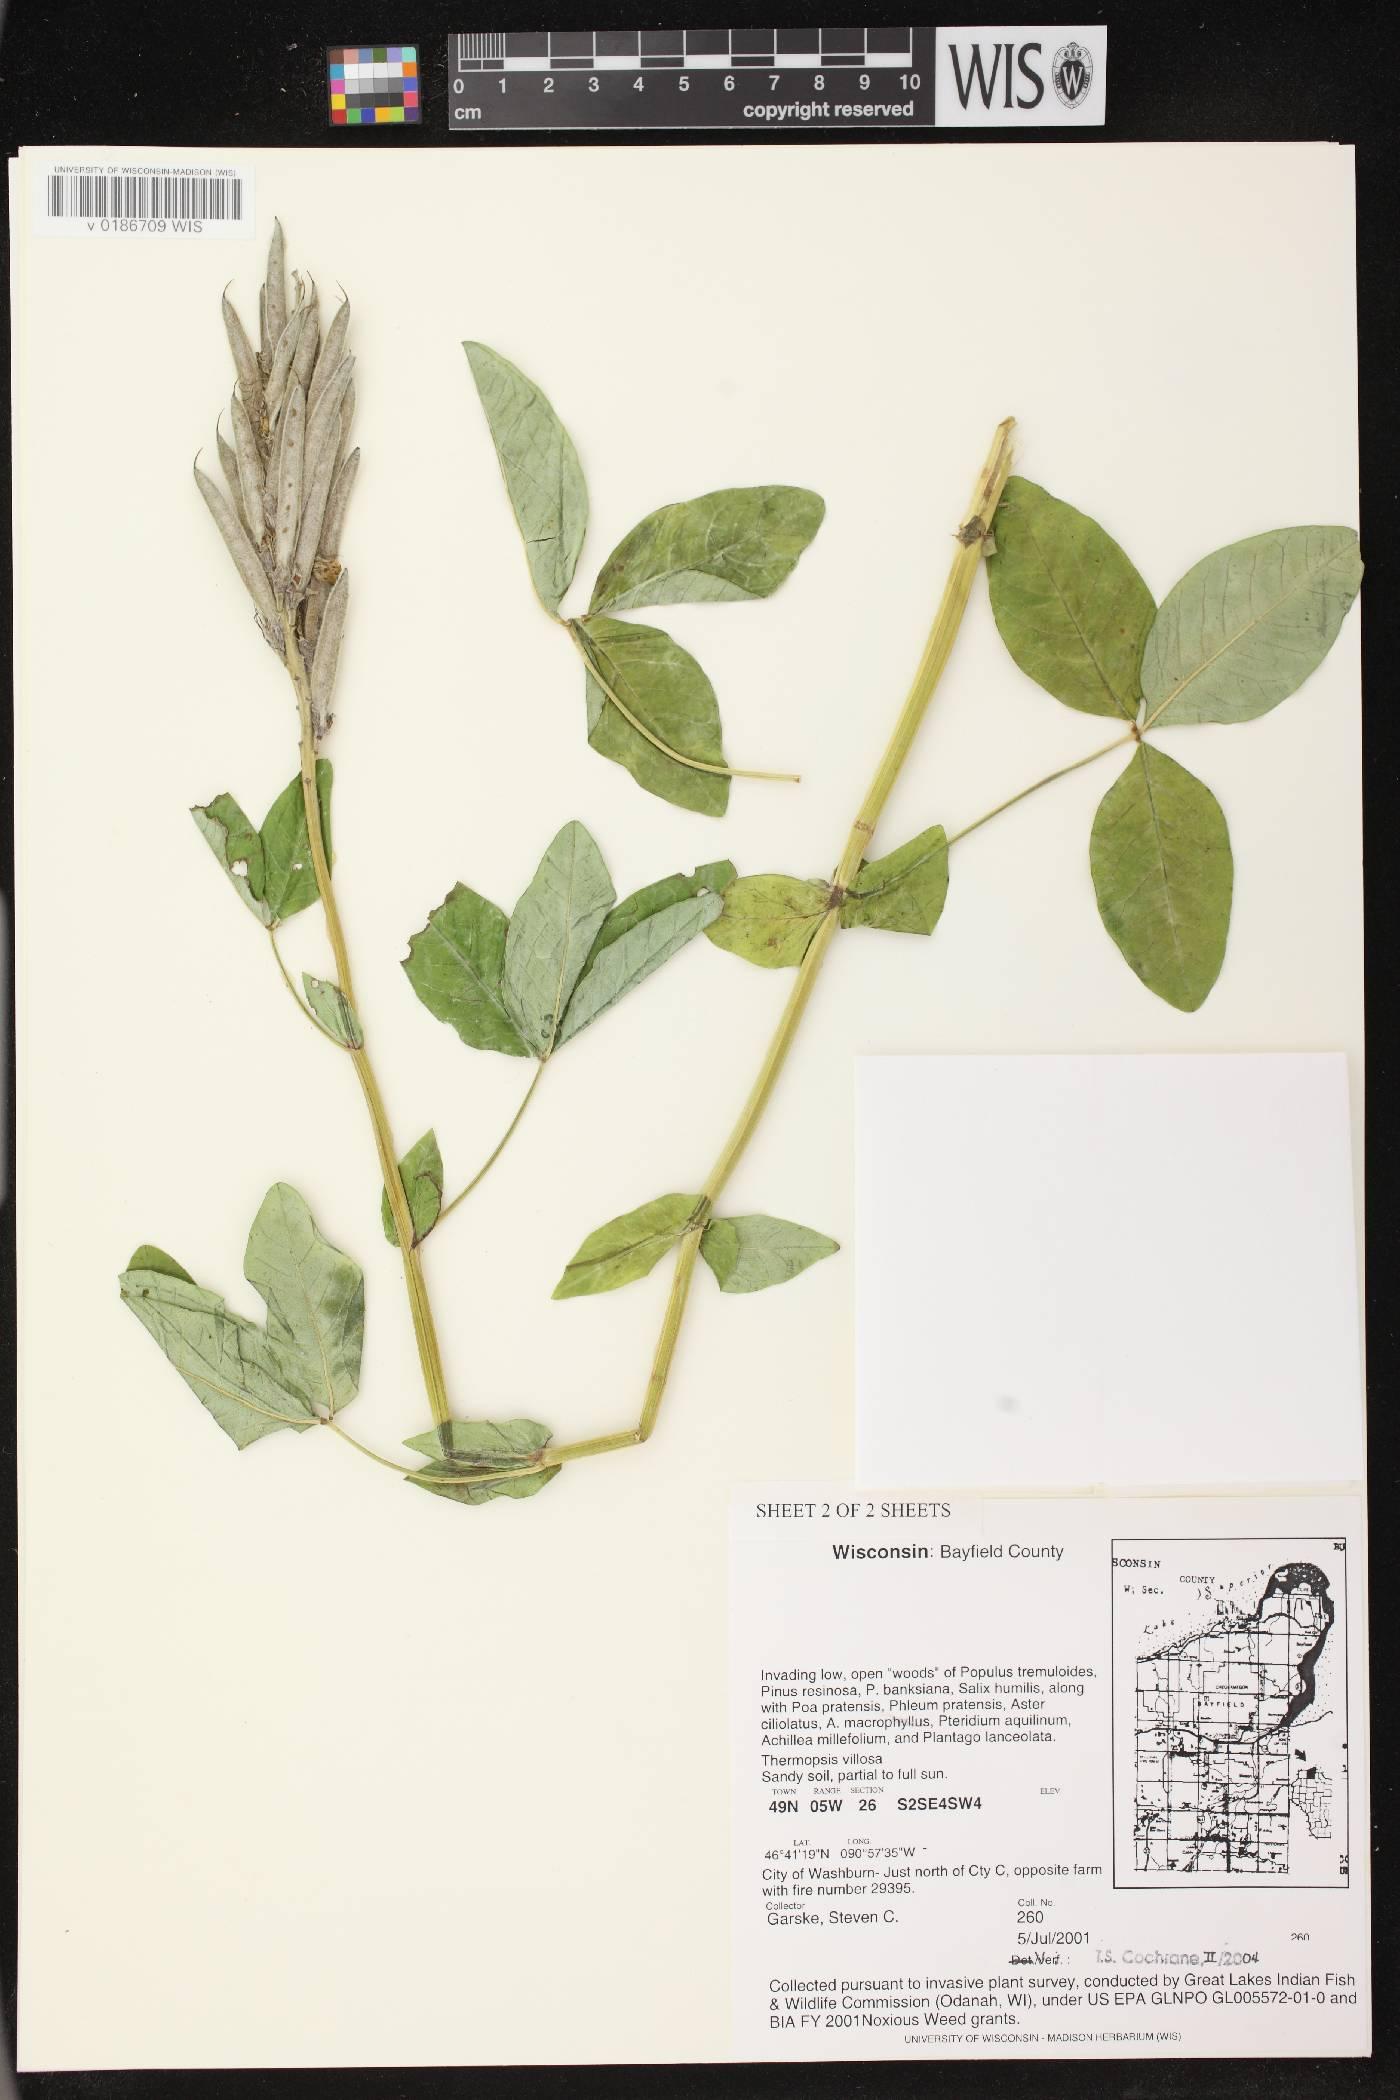 Thermopsis villosa image